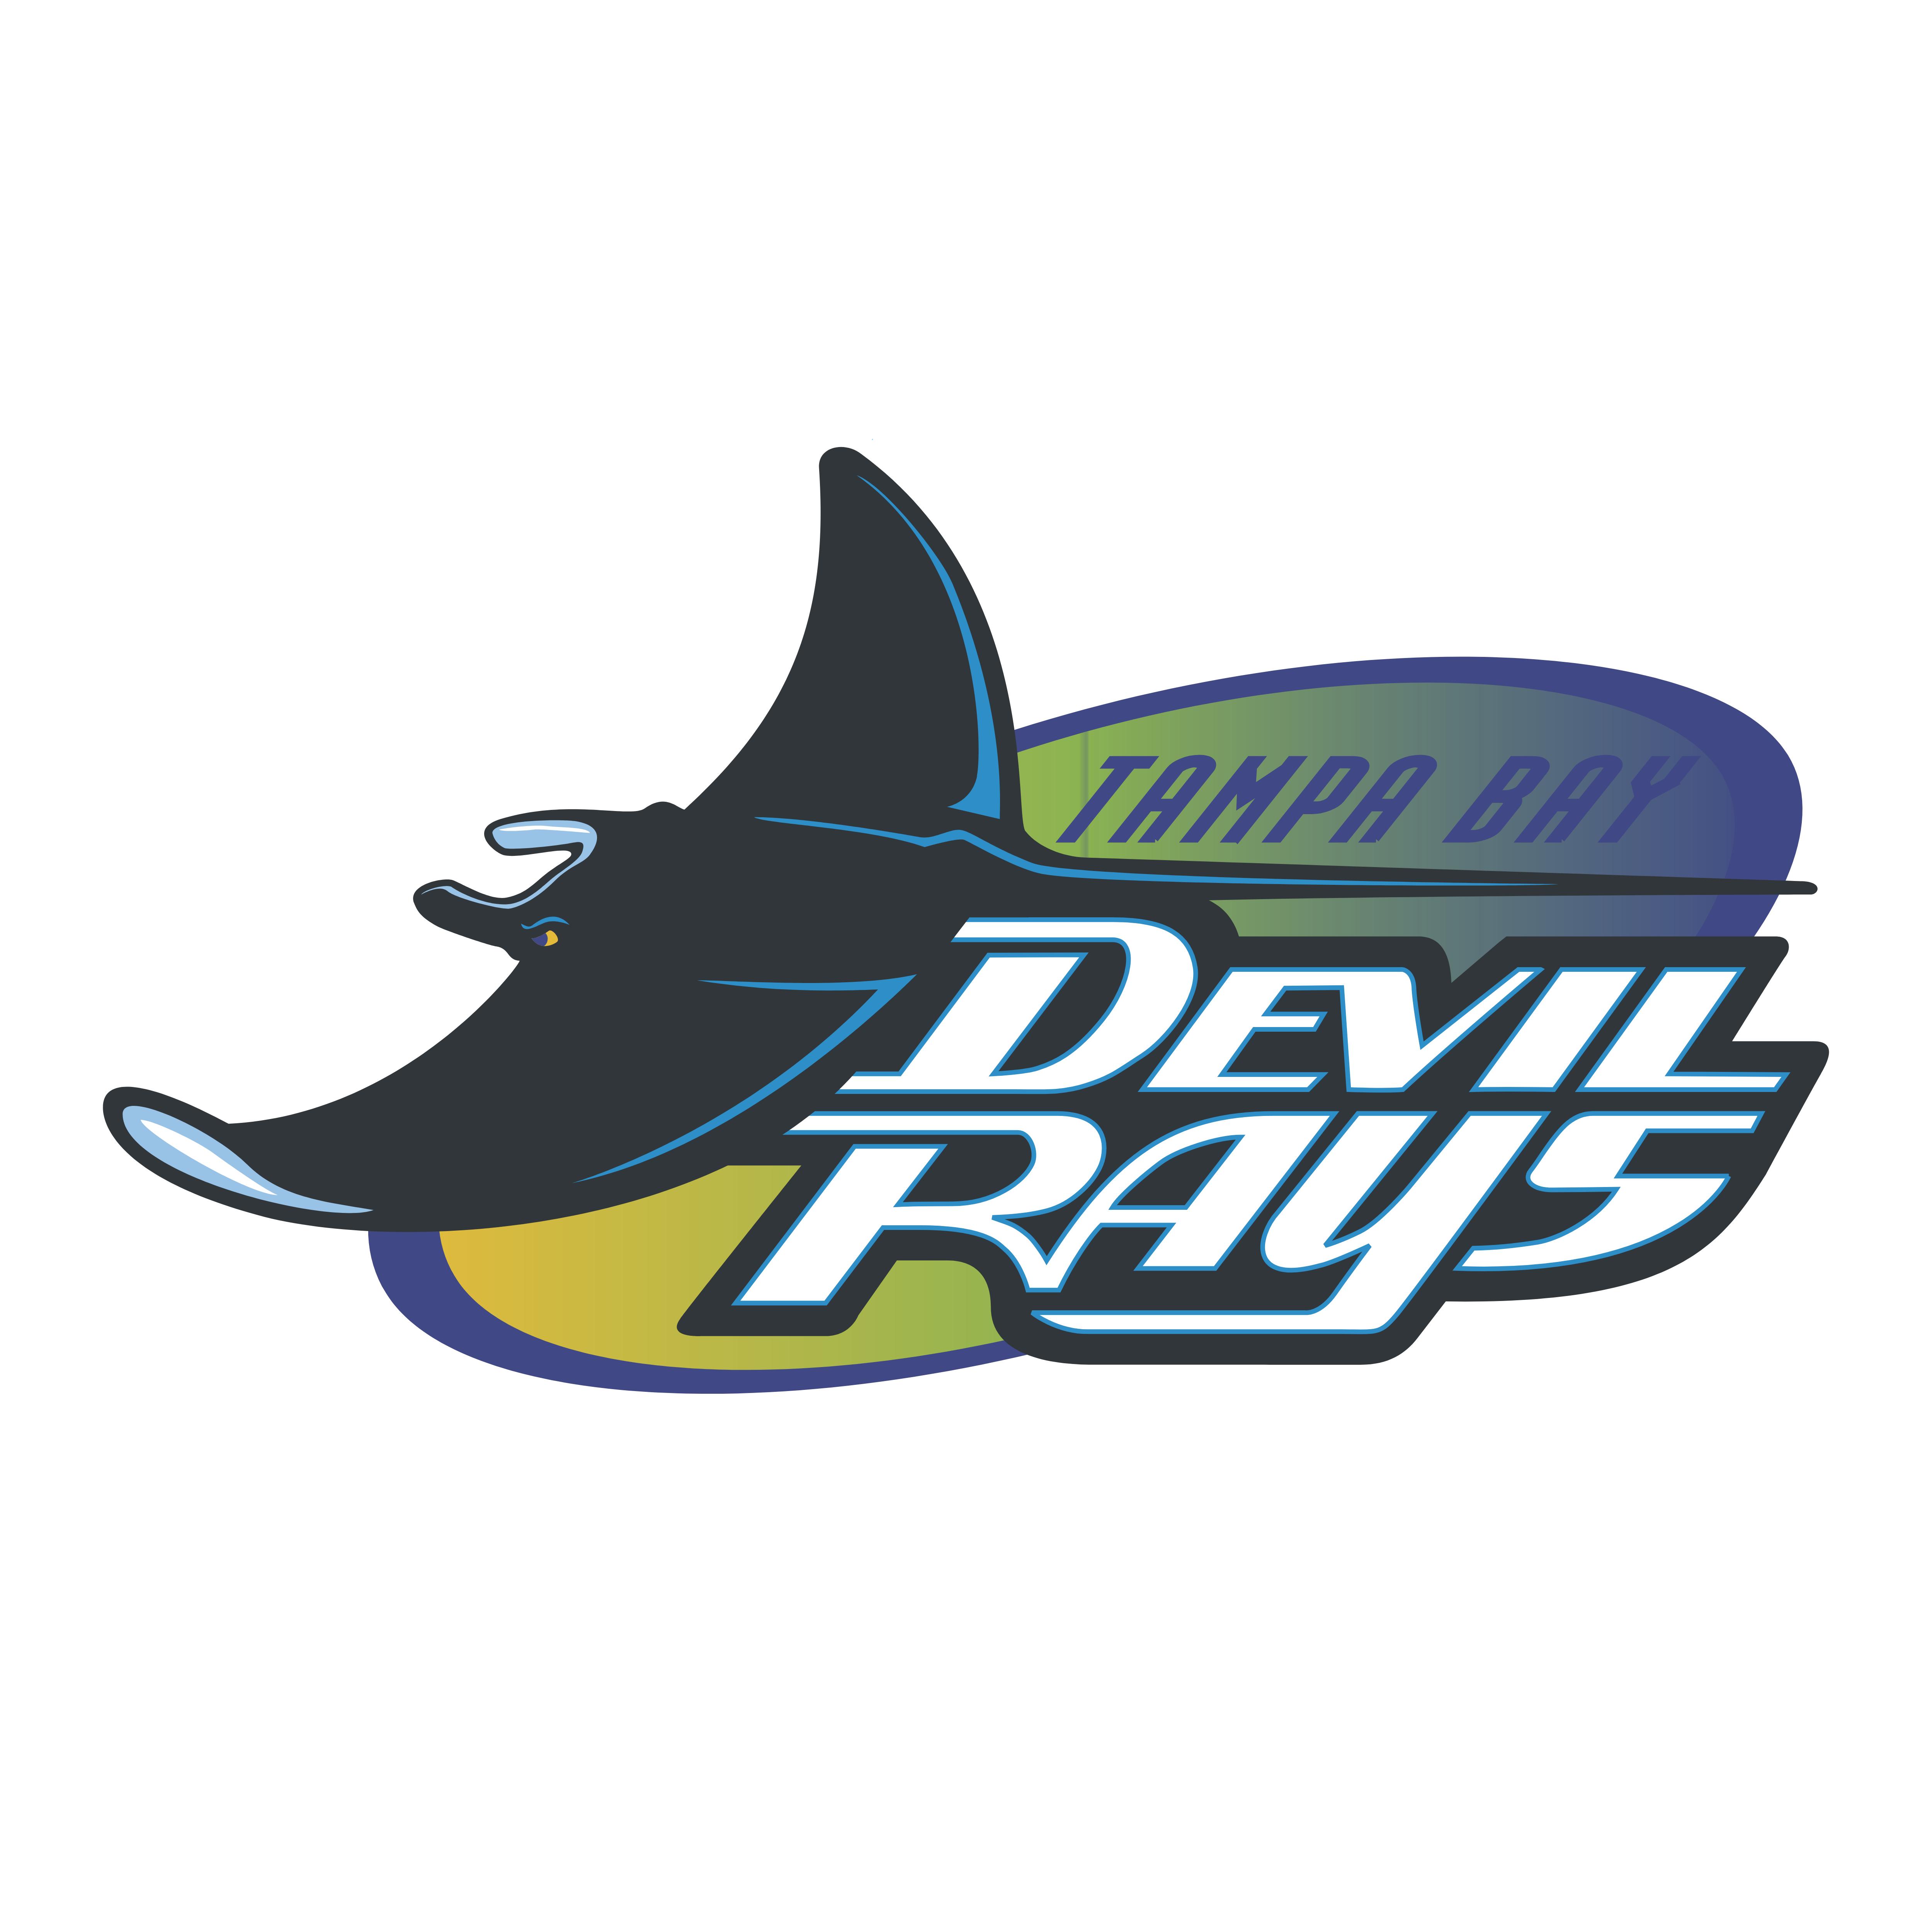 Tampa Bay Devil Rays – Logos Download